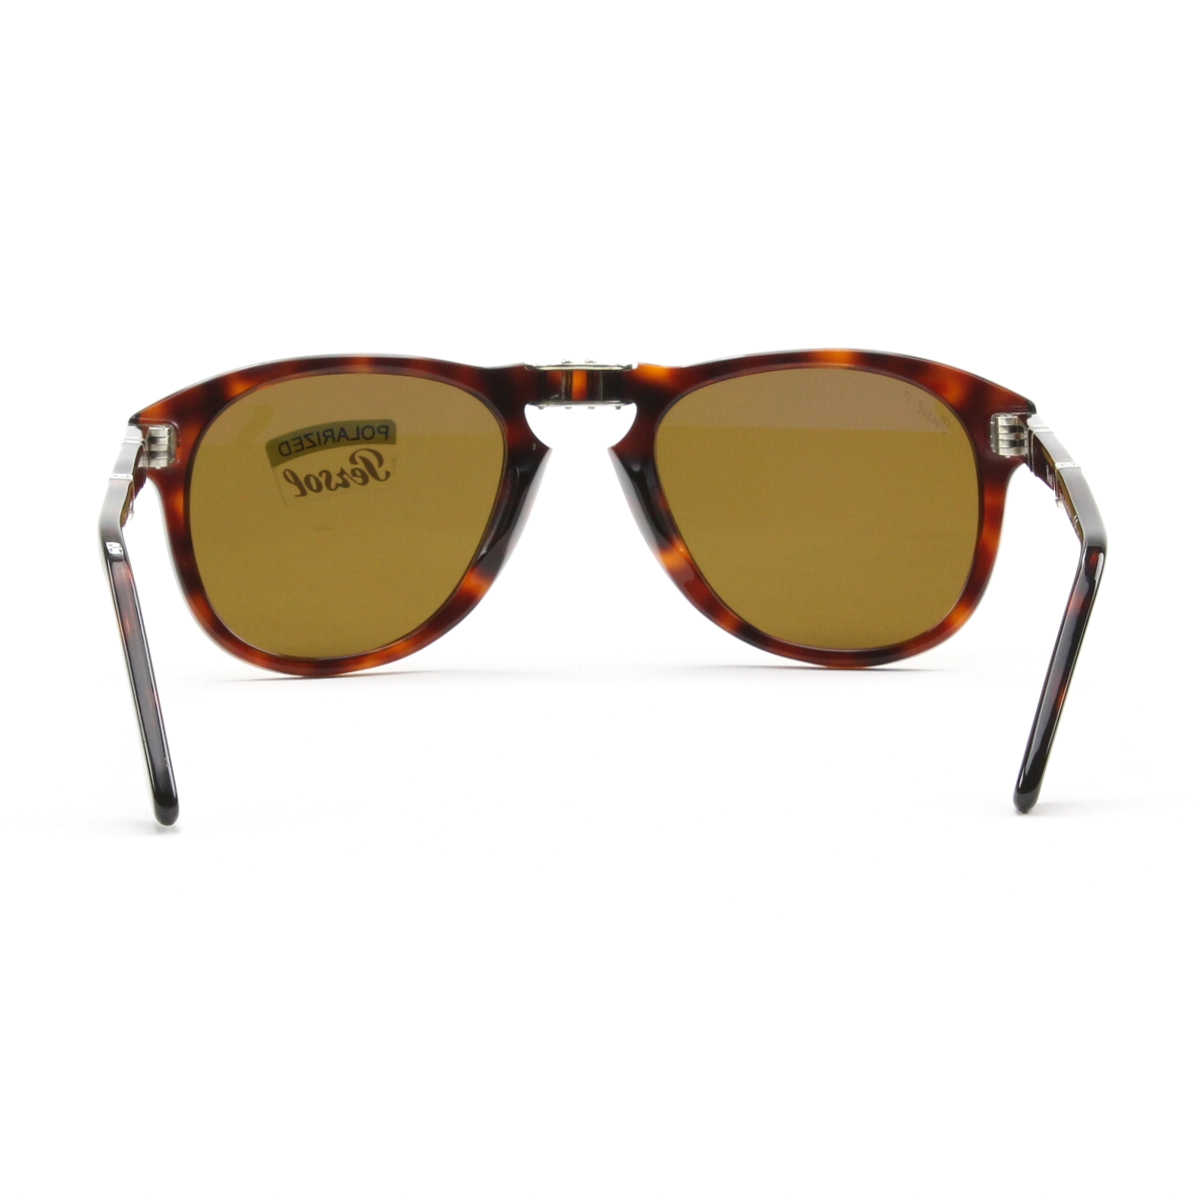 95be99f859 Persol Sunglasses Uk Stockists